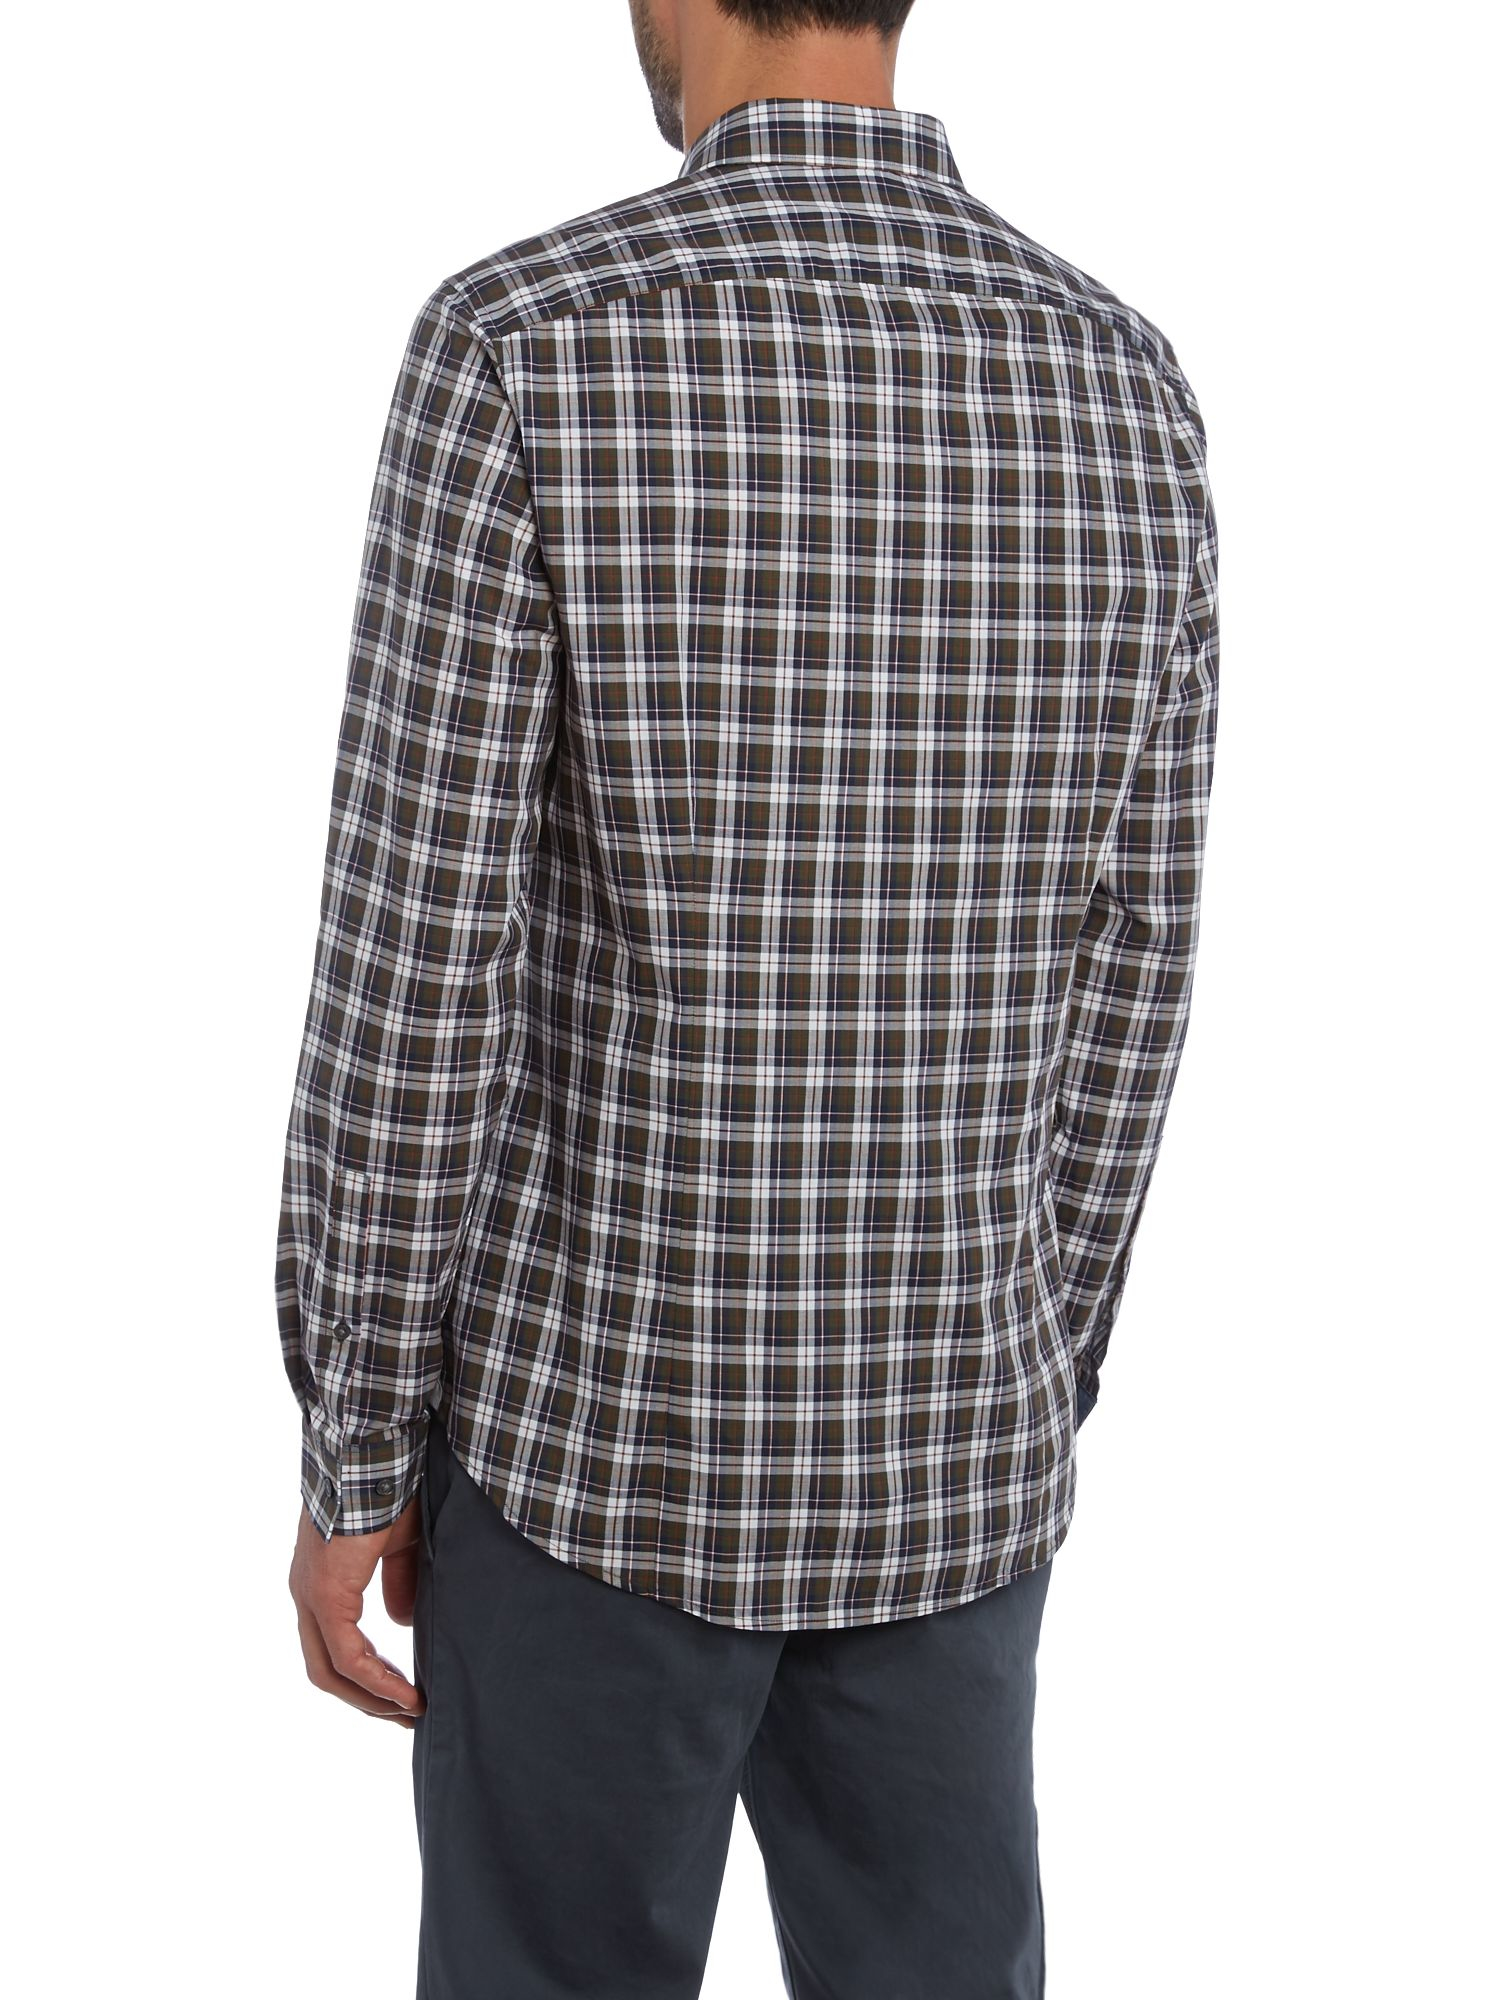 Michael kors slim fit mini collar plaid check shirt in for Slim fit check shirt